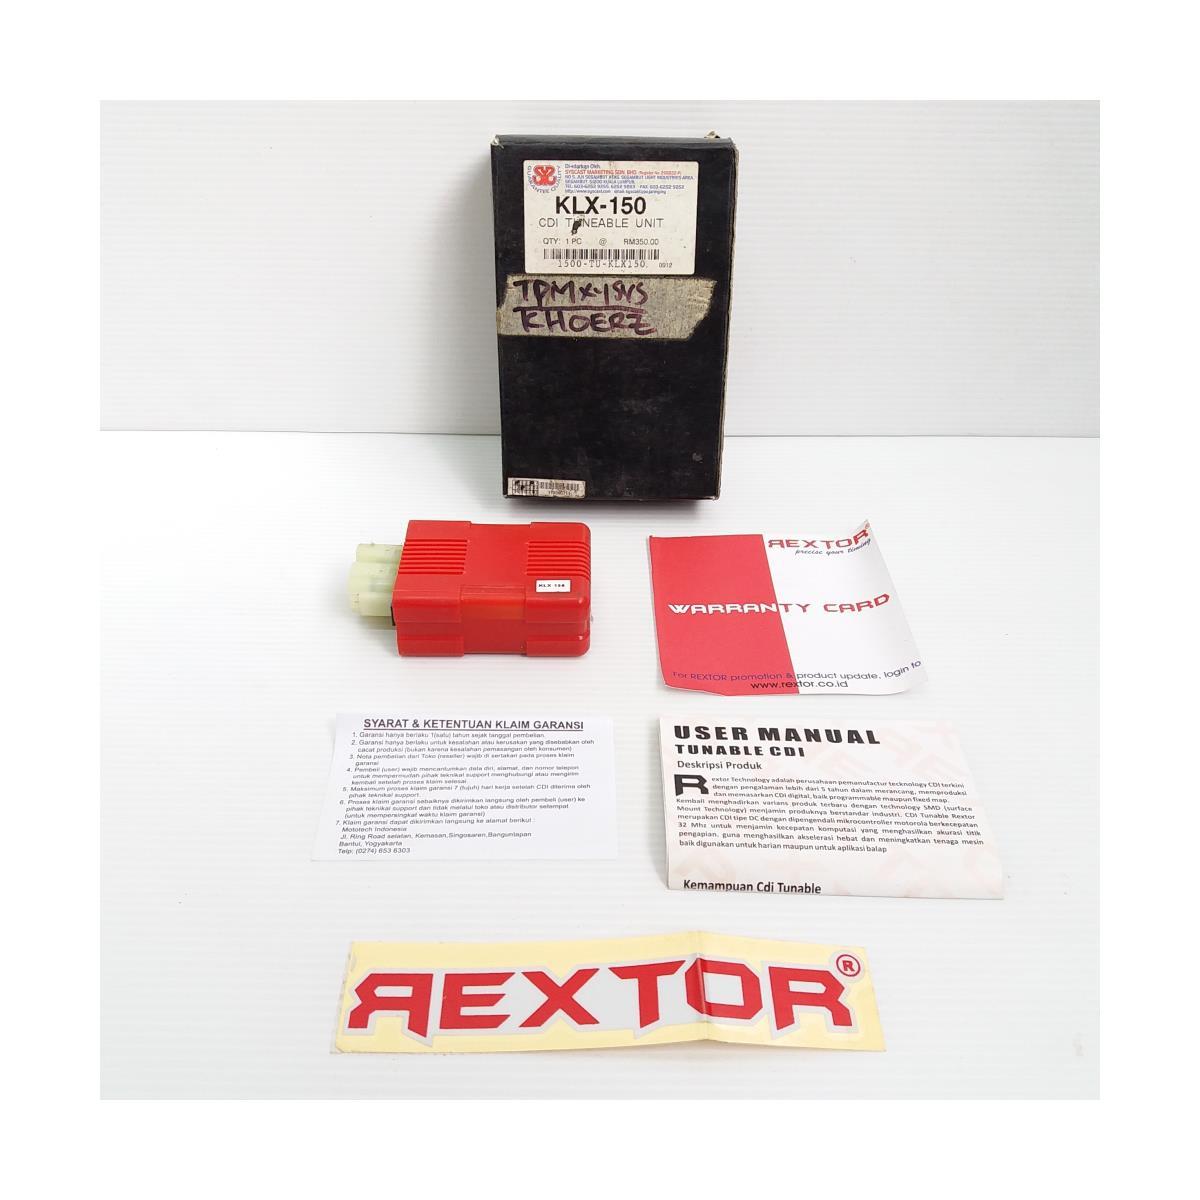 CDI UNIT (TUNEABLE) KLX150 (REXTOR)